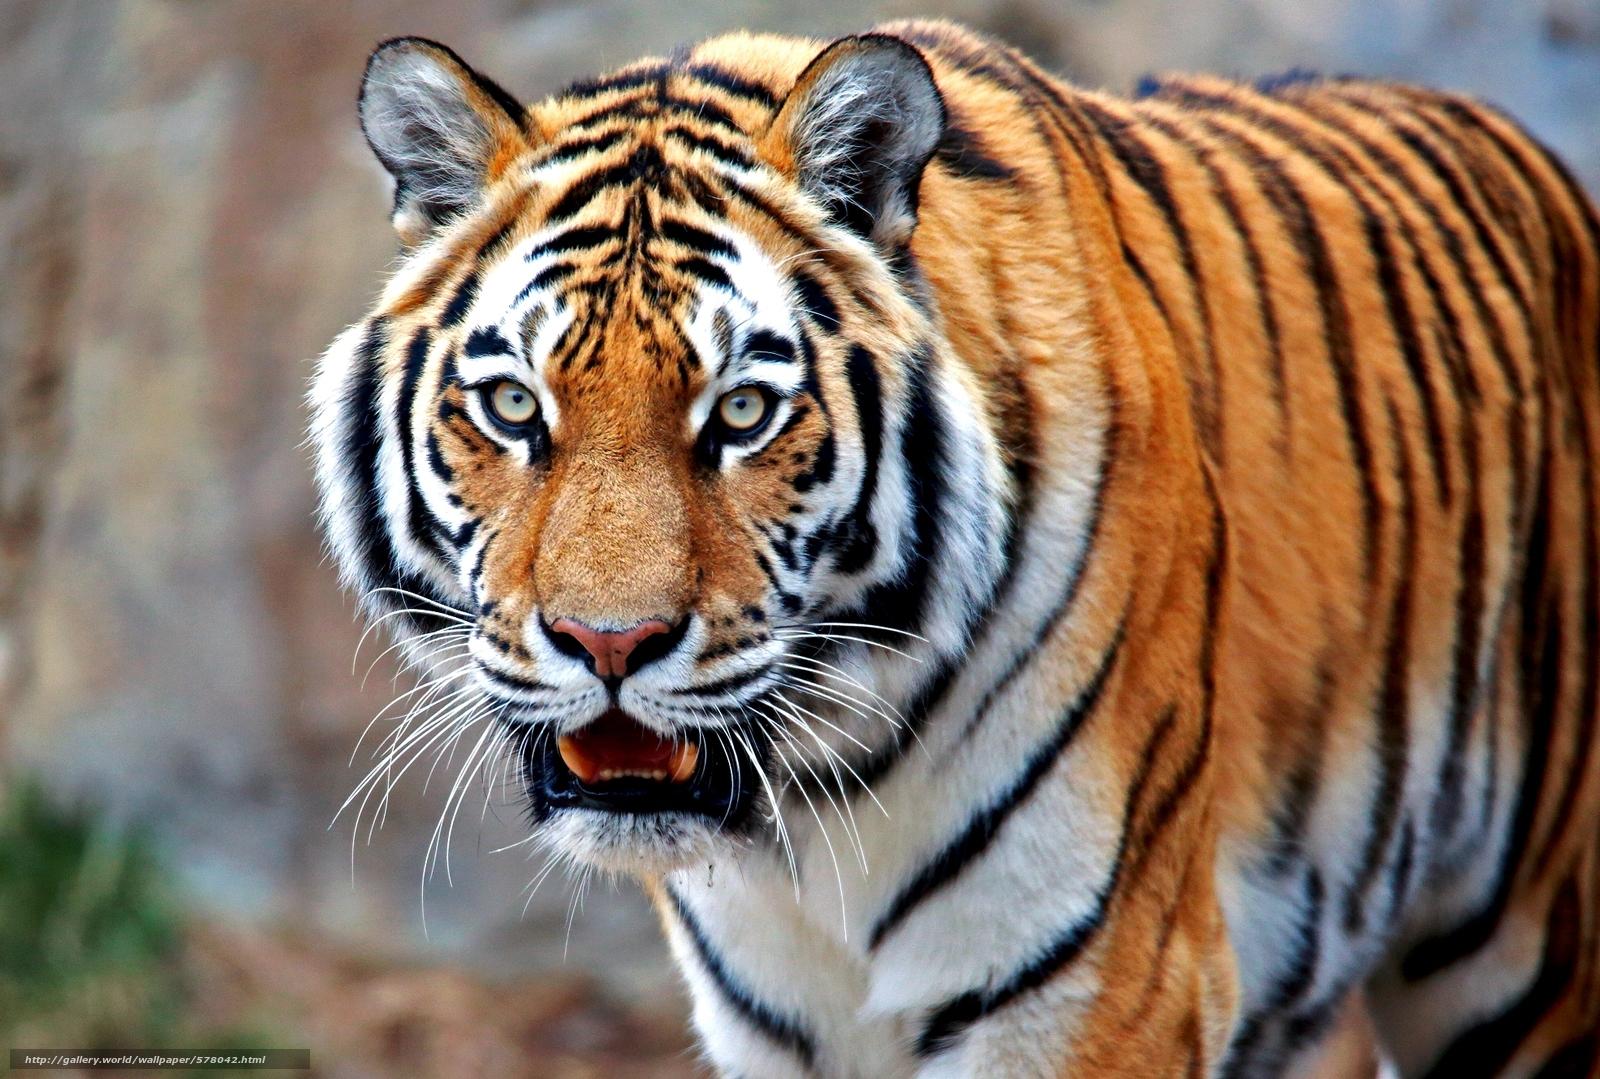 Mostrar paredes de tira de tigre